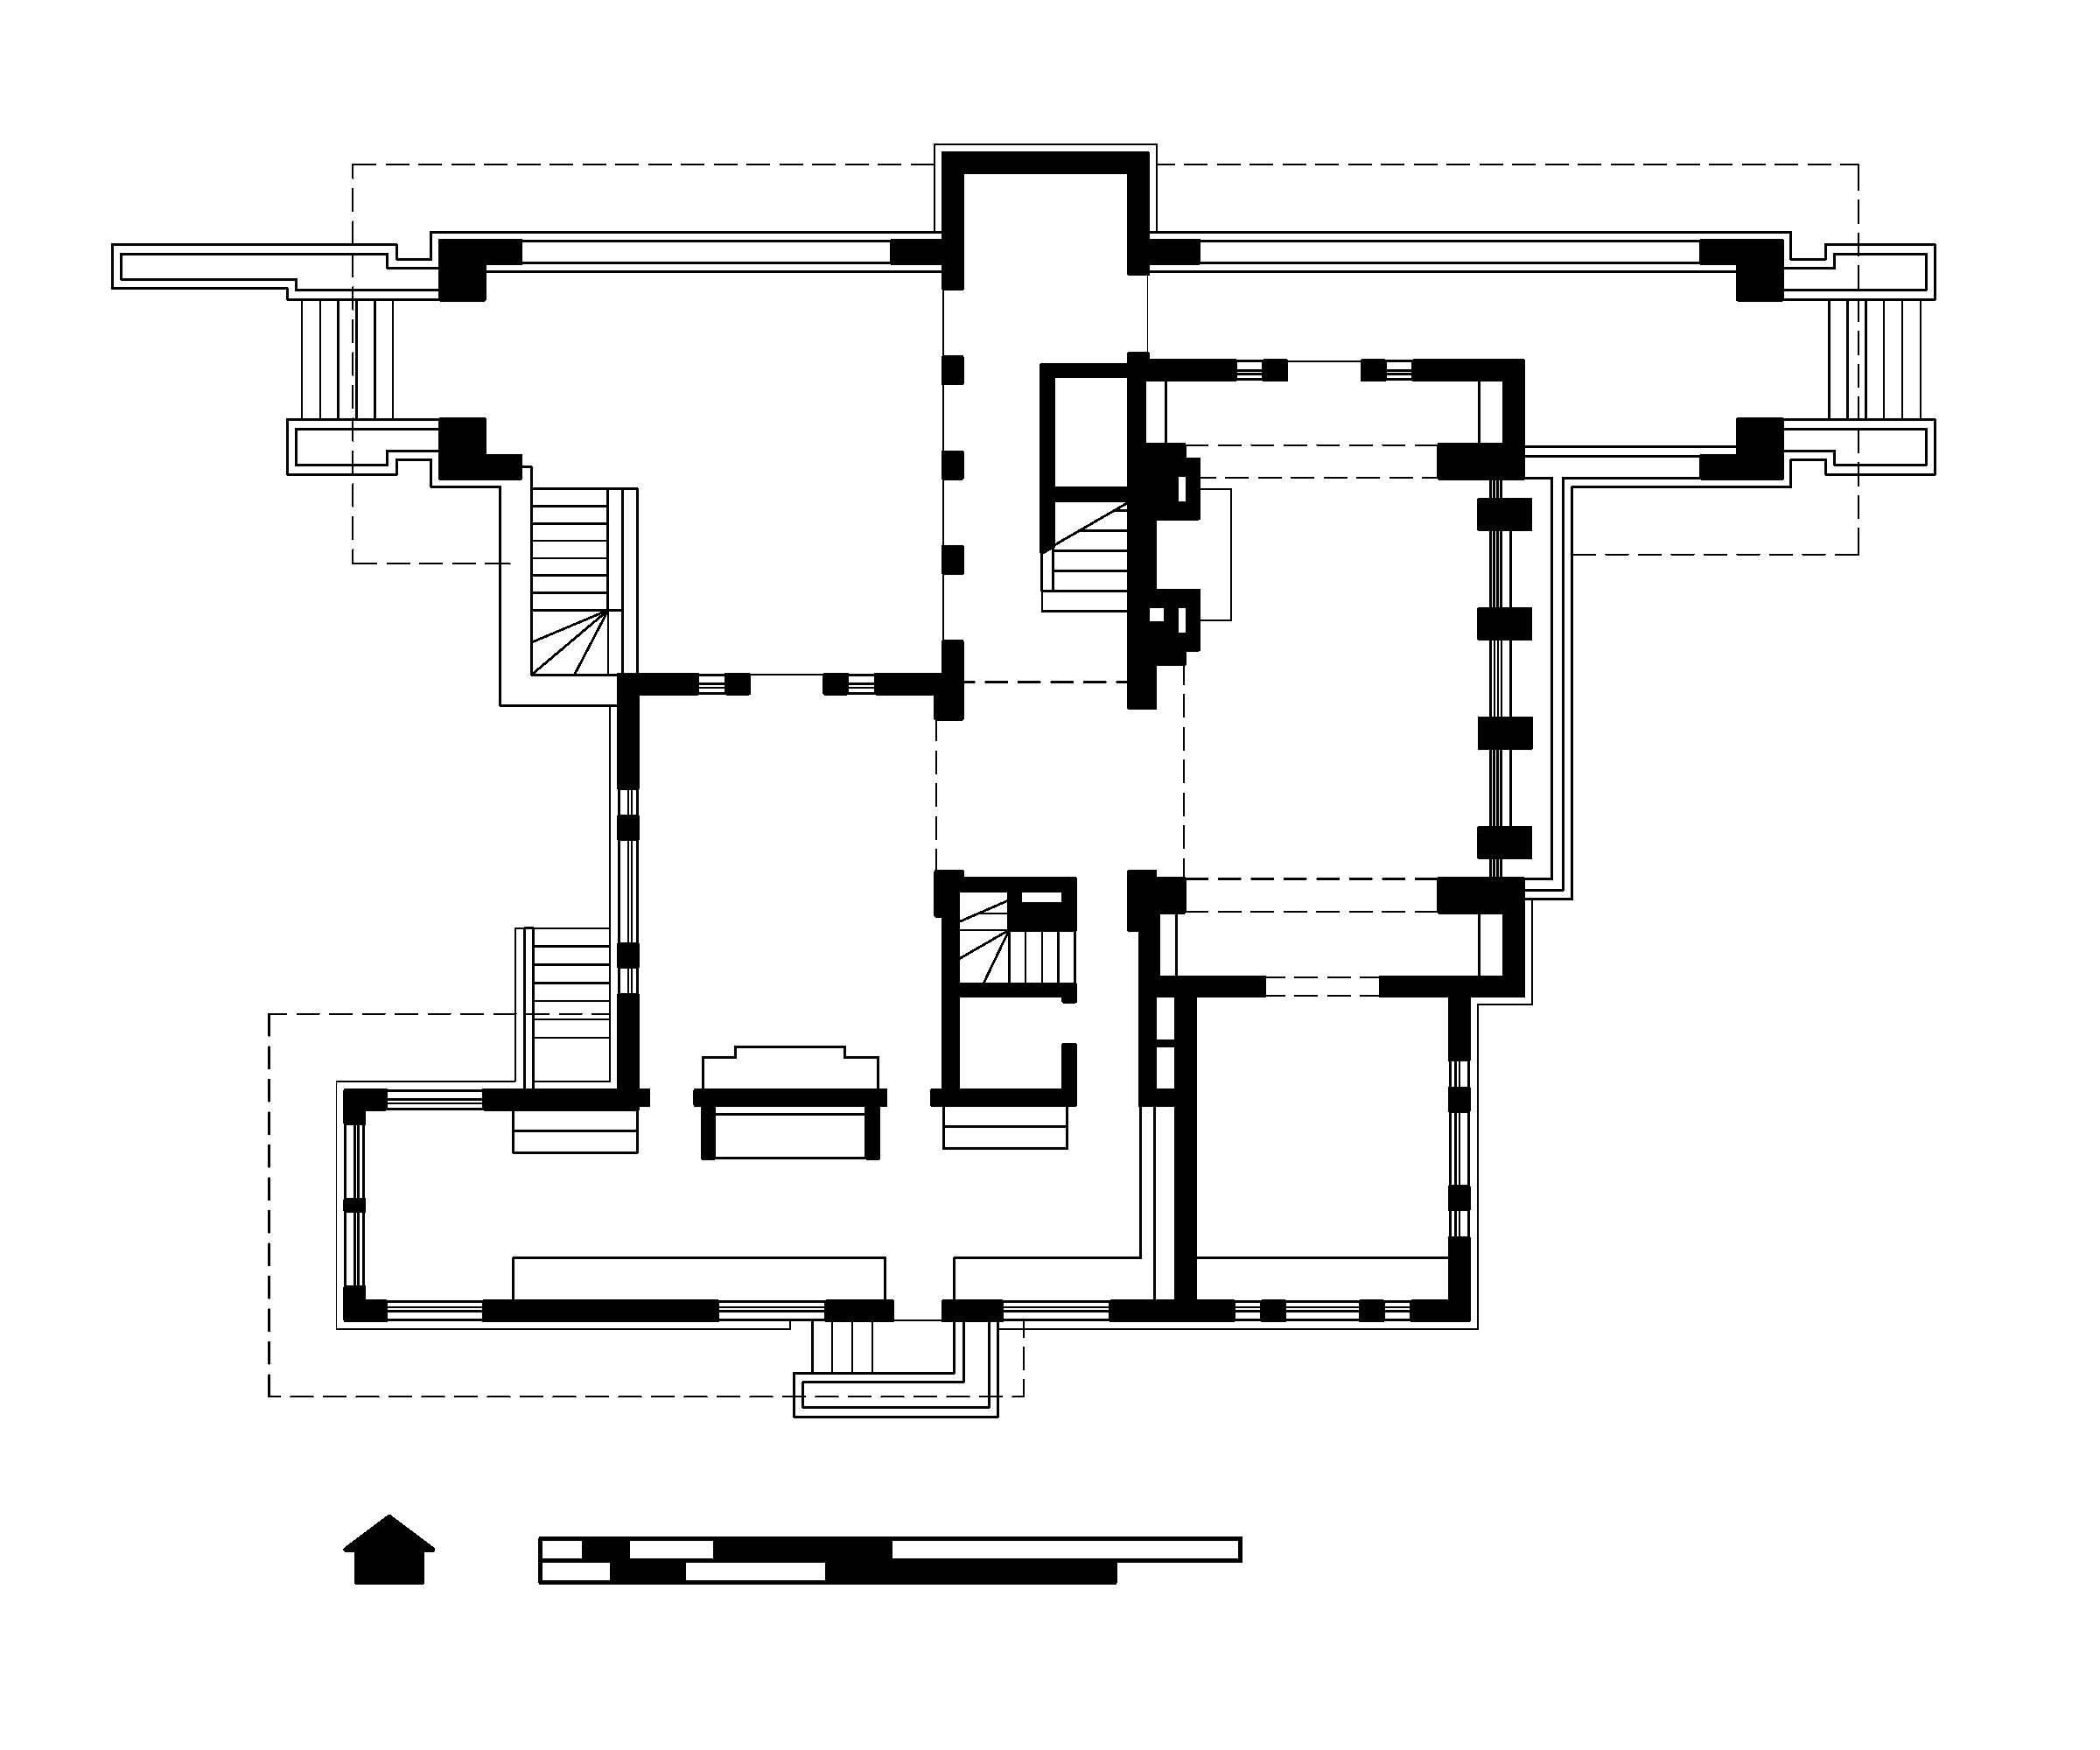 file hills decaro house first floor plan jpg wikipedia